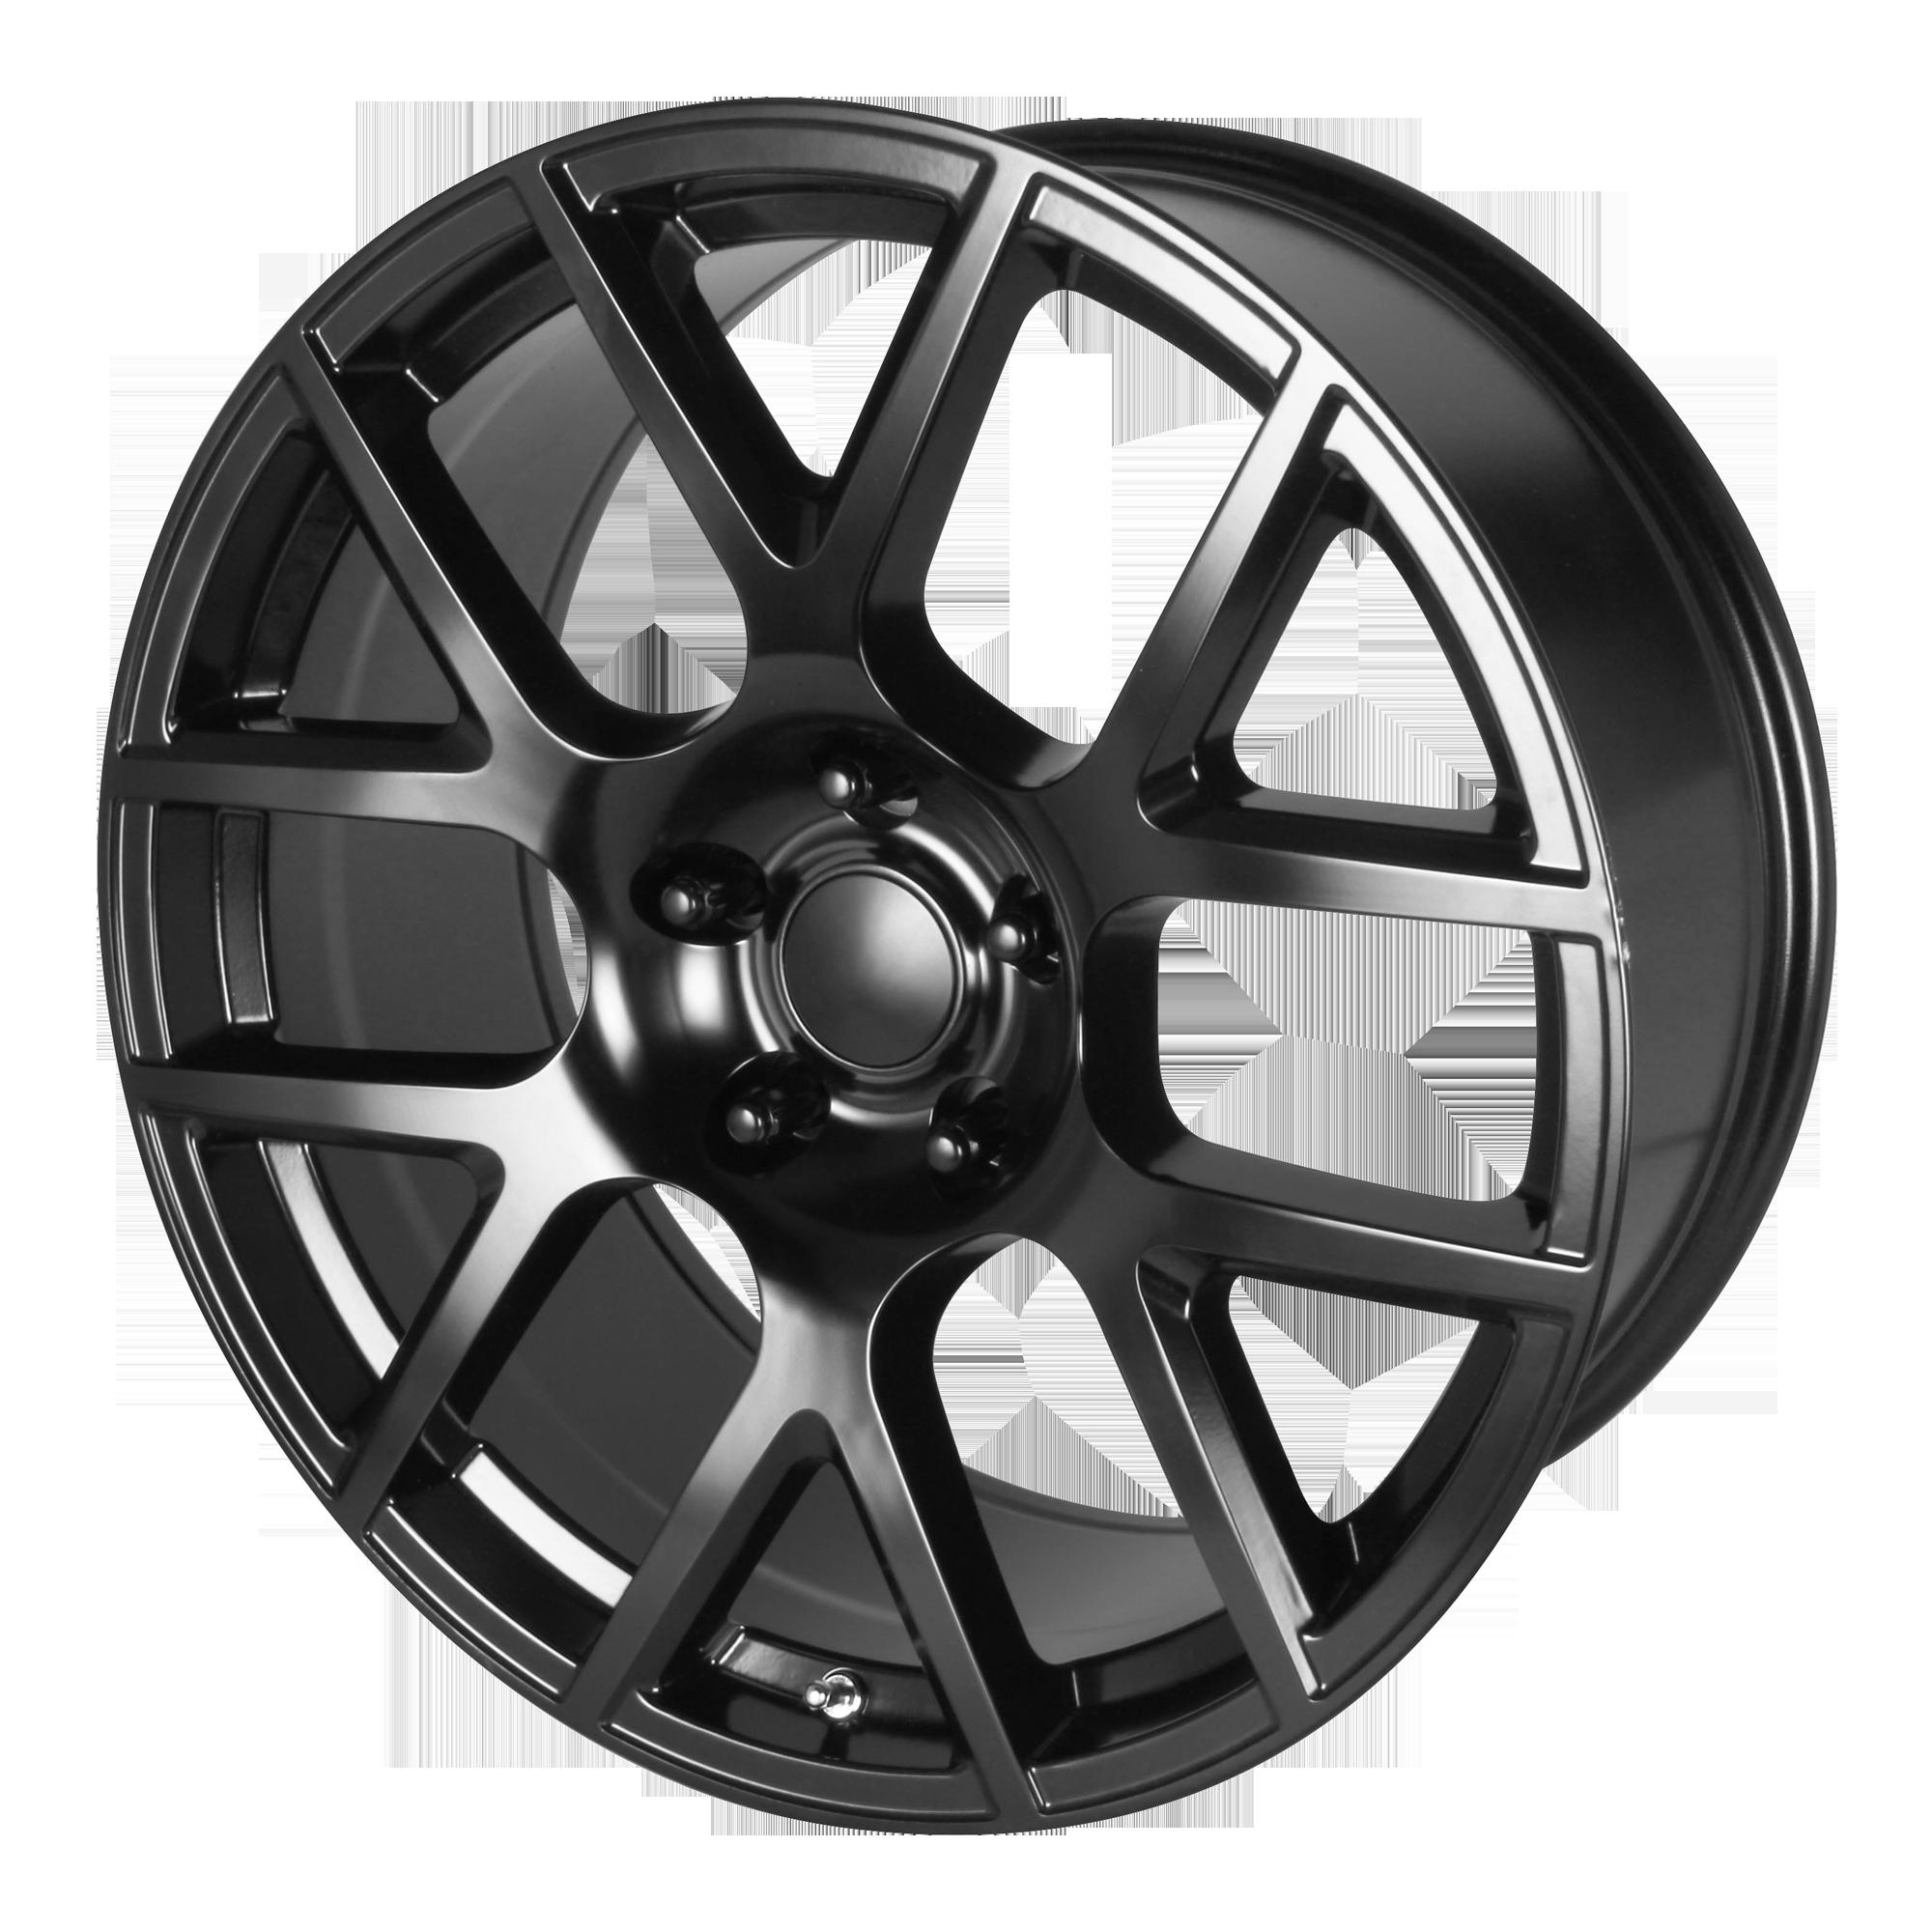 OE Creations Replica Wheels OE Creations PR163 Satin Black